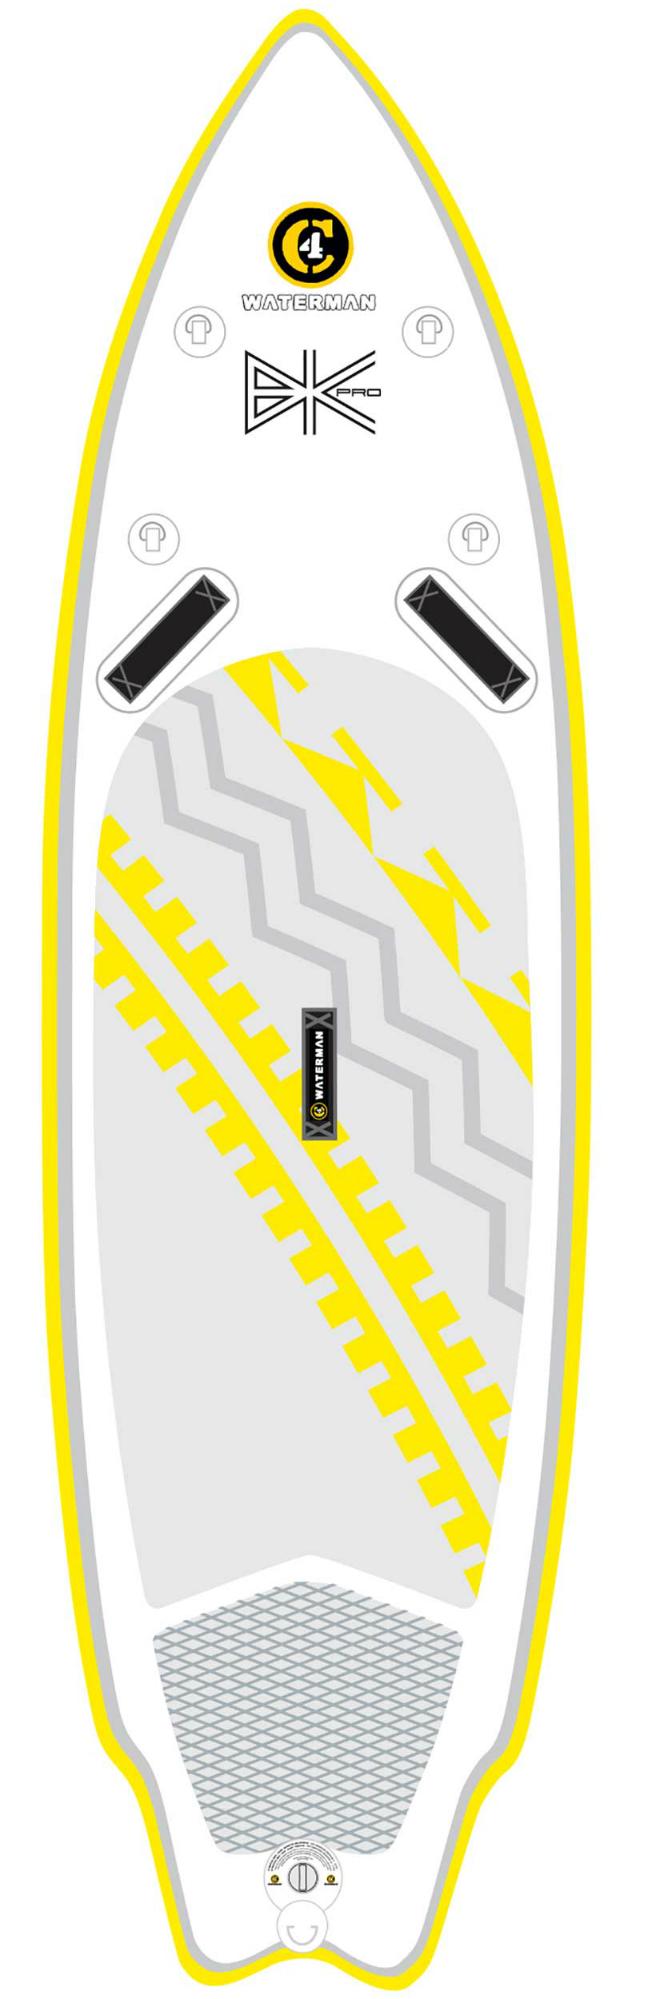 C4 Waterman BK Pro 9'10